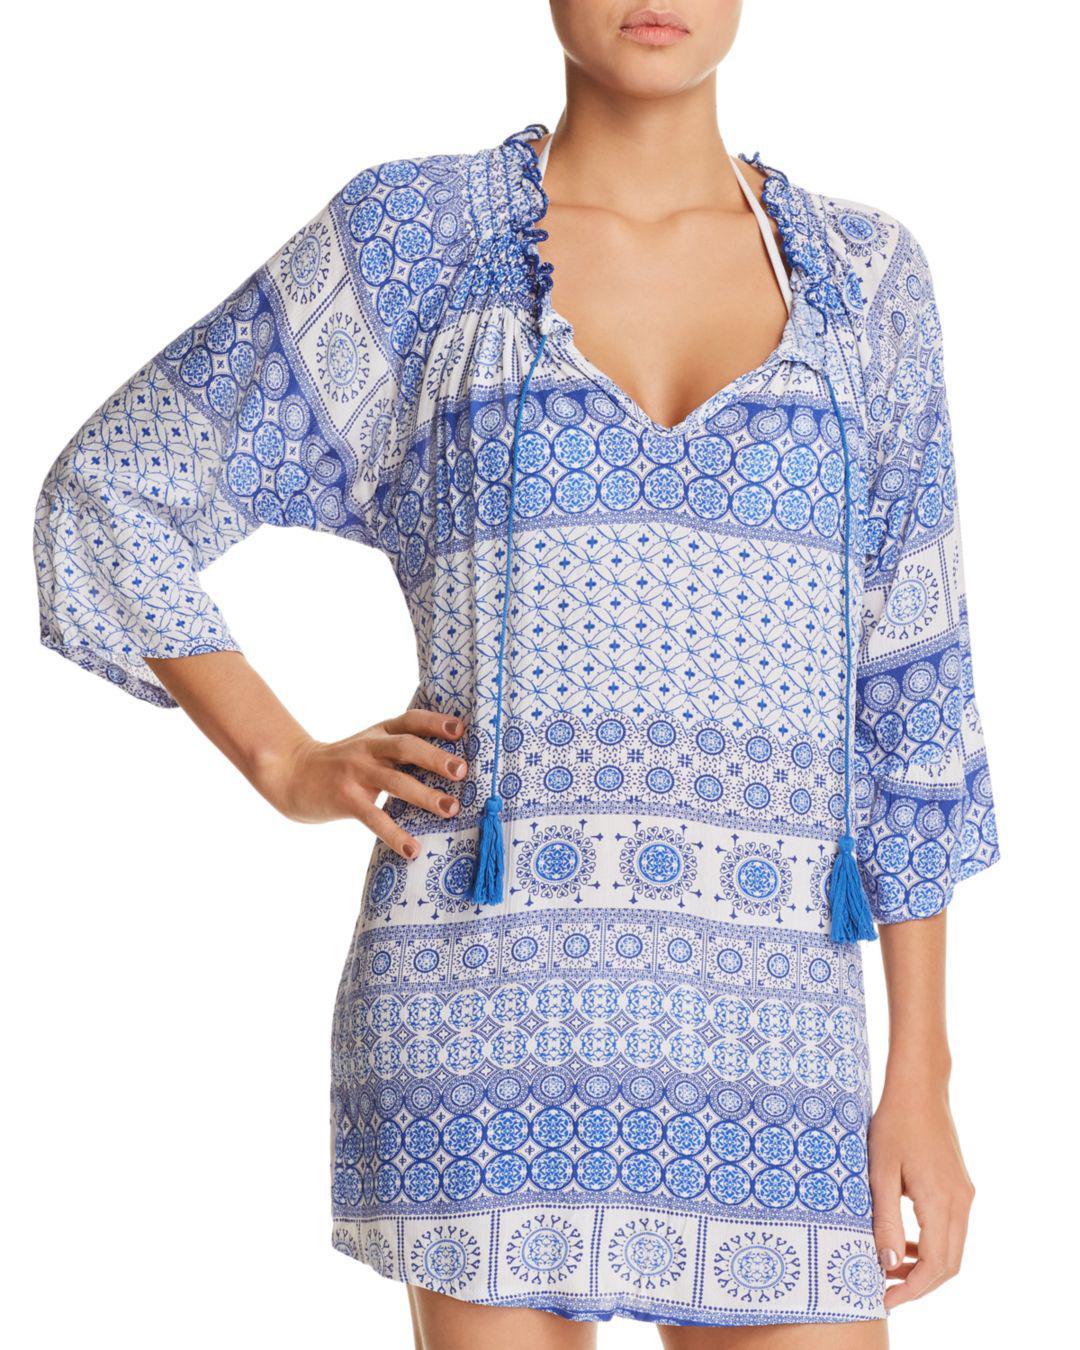 1032e77eb6 Lyst - J Valdi Tassel Tunic Dress Swim Cover-up in Blue